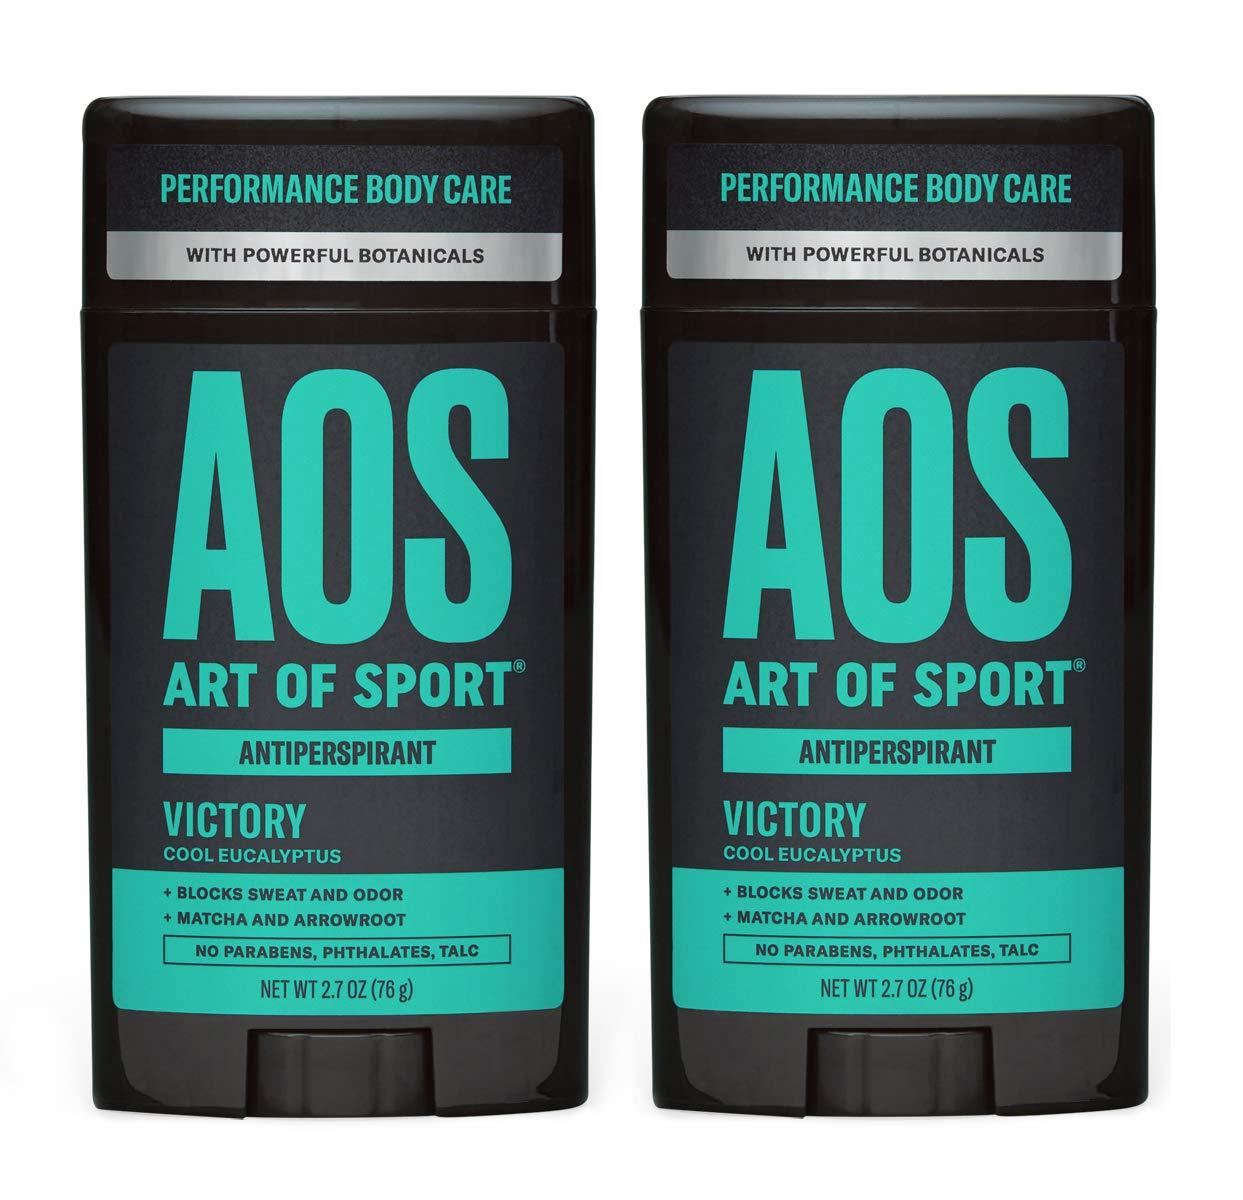 Art of Sport Men's Antiperspirant Deodorant (2-Pack) - Victory Scent - Antiperspirant for Men with Natural Botanicals Matcha and Arrowroot - Energizing Citrus Fragrance - Made for Athletes - 2.7oz